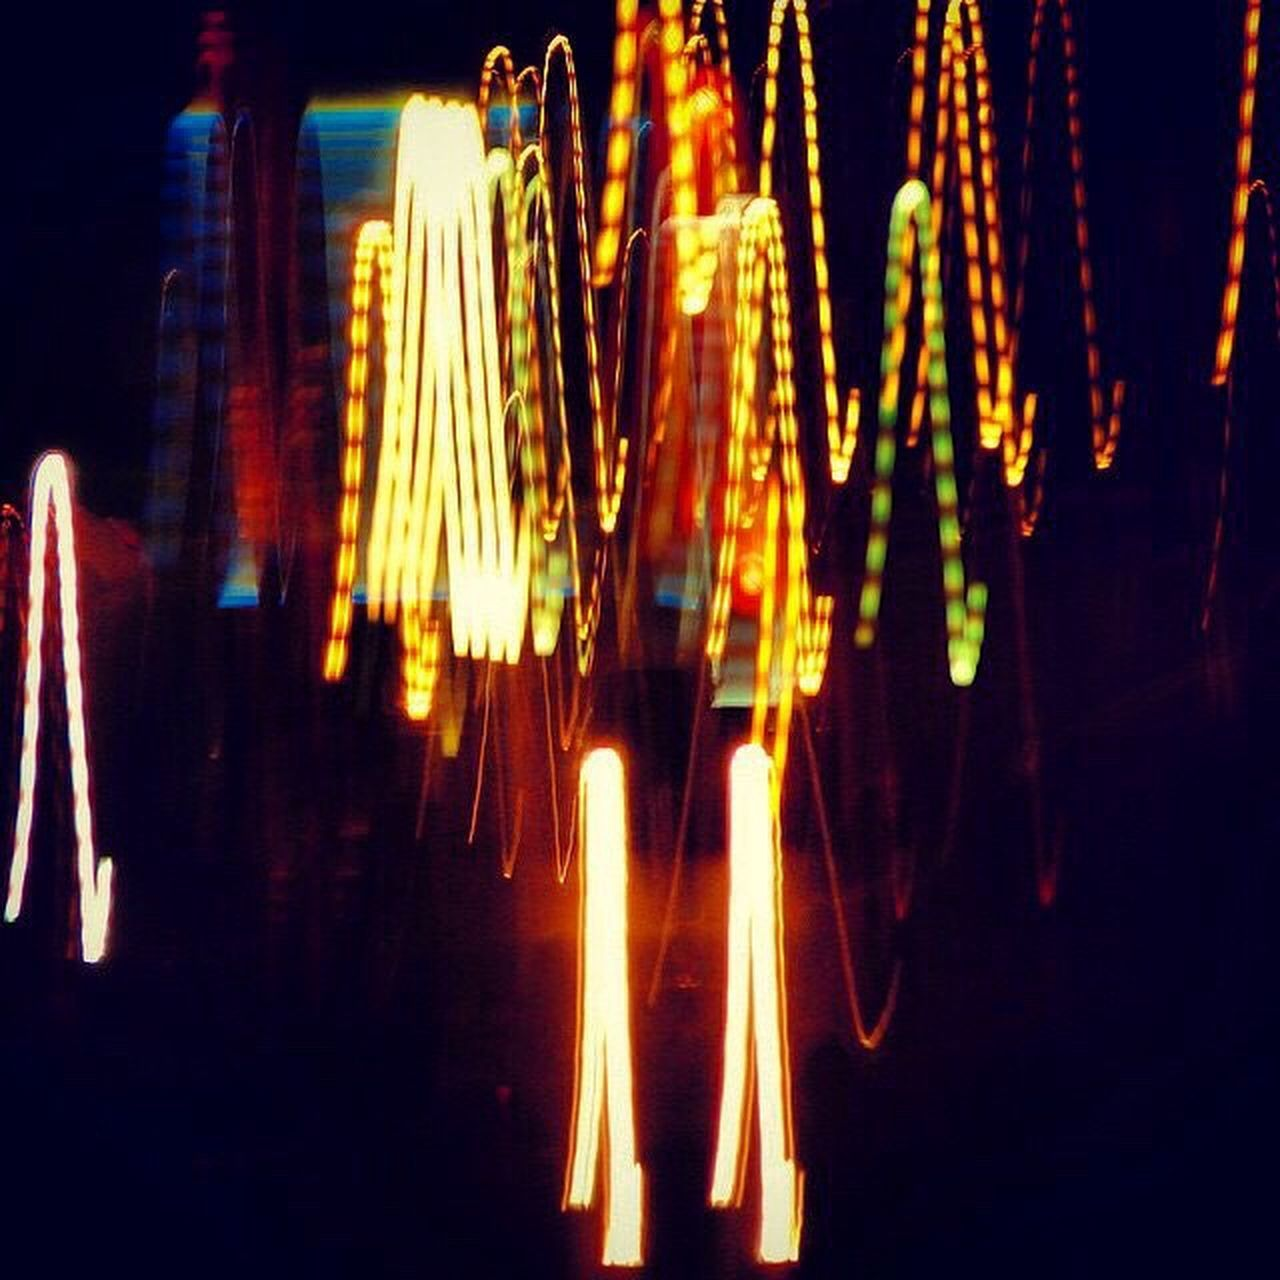 illuminated, night, no people, outdoors, close-up